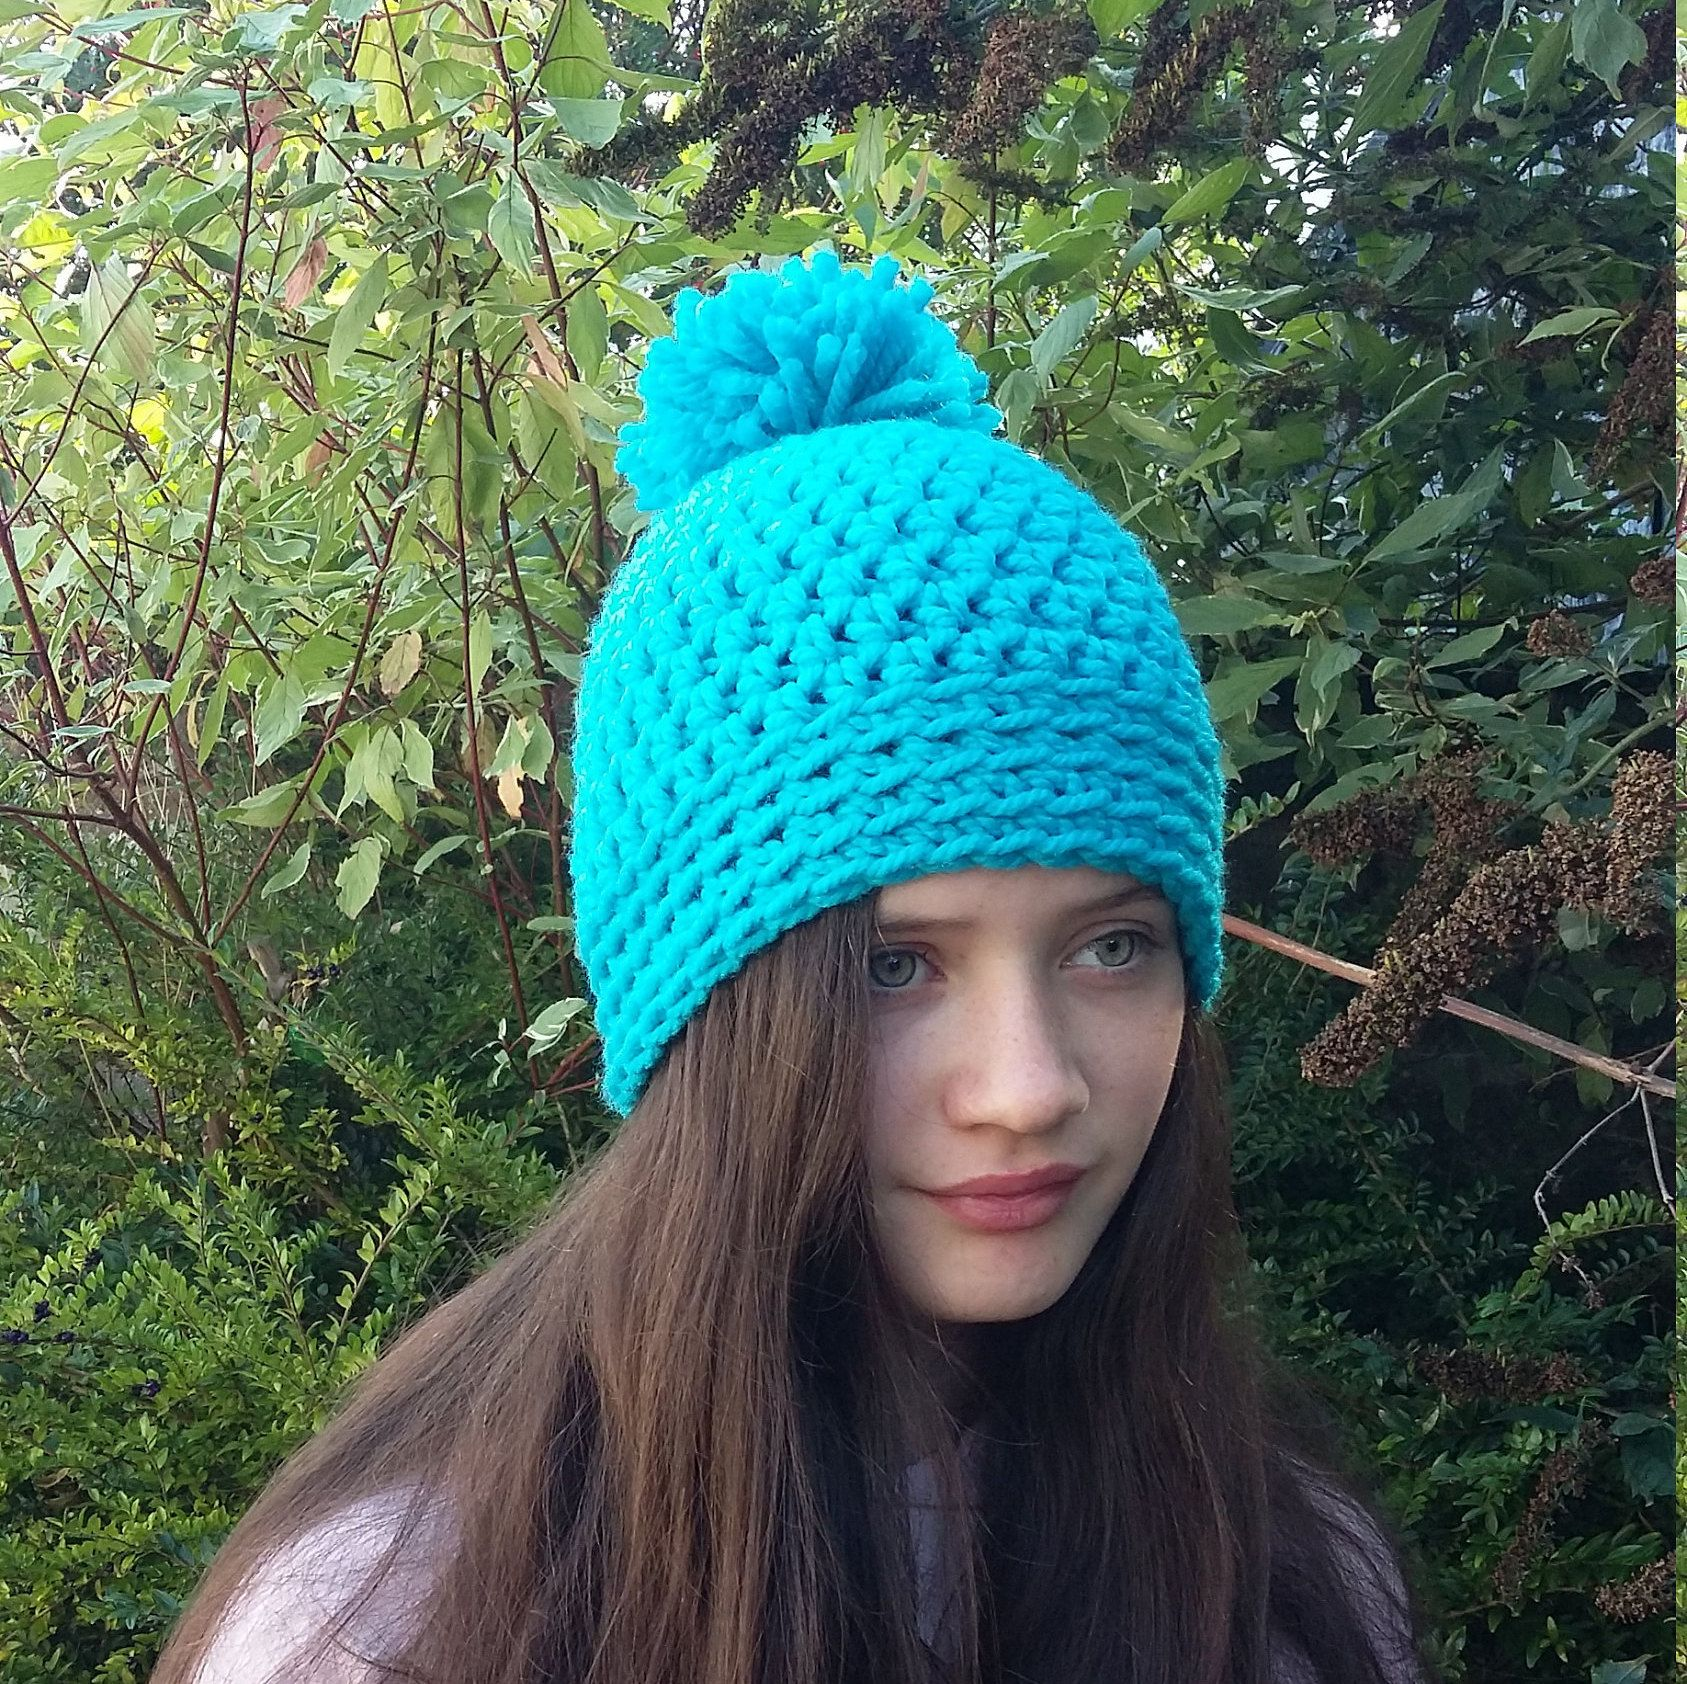 7ec9a5a2993e3 Ladies winter hat.  hats  fashion  woollyhat  crochethat  handmadehat